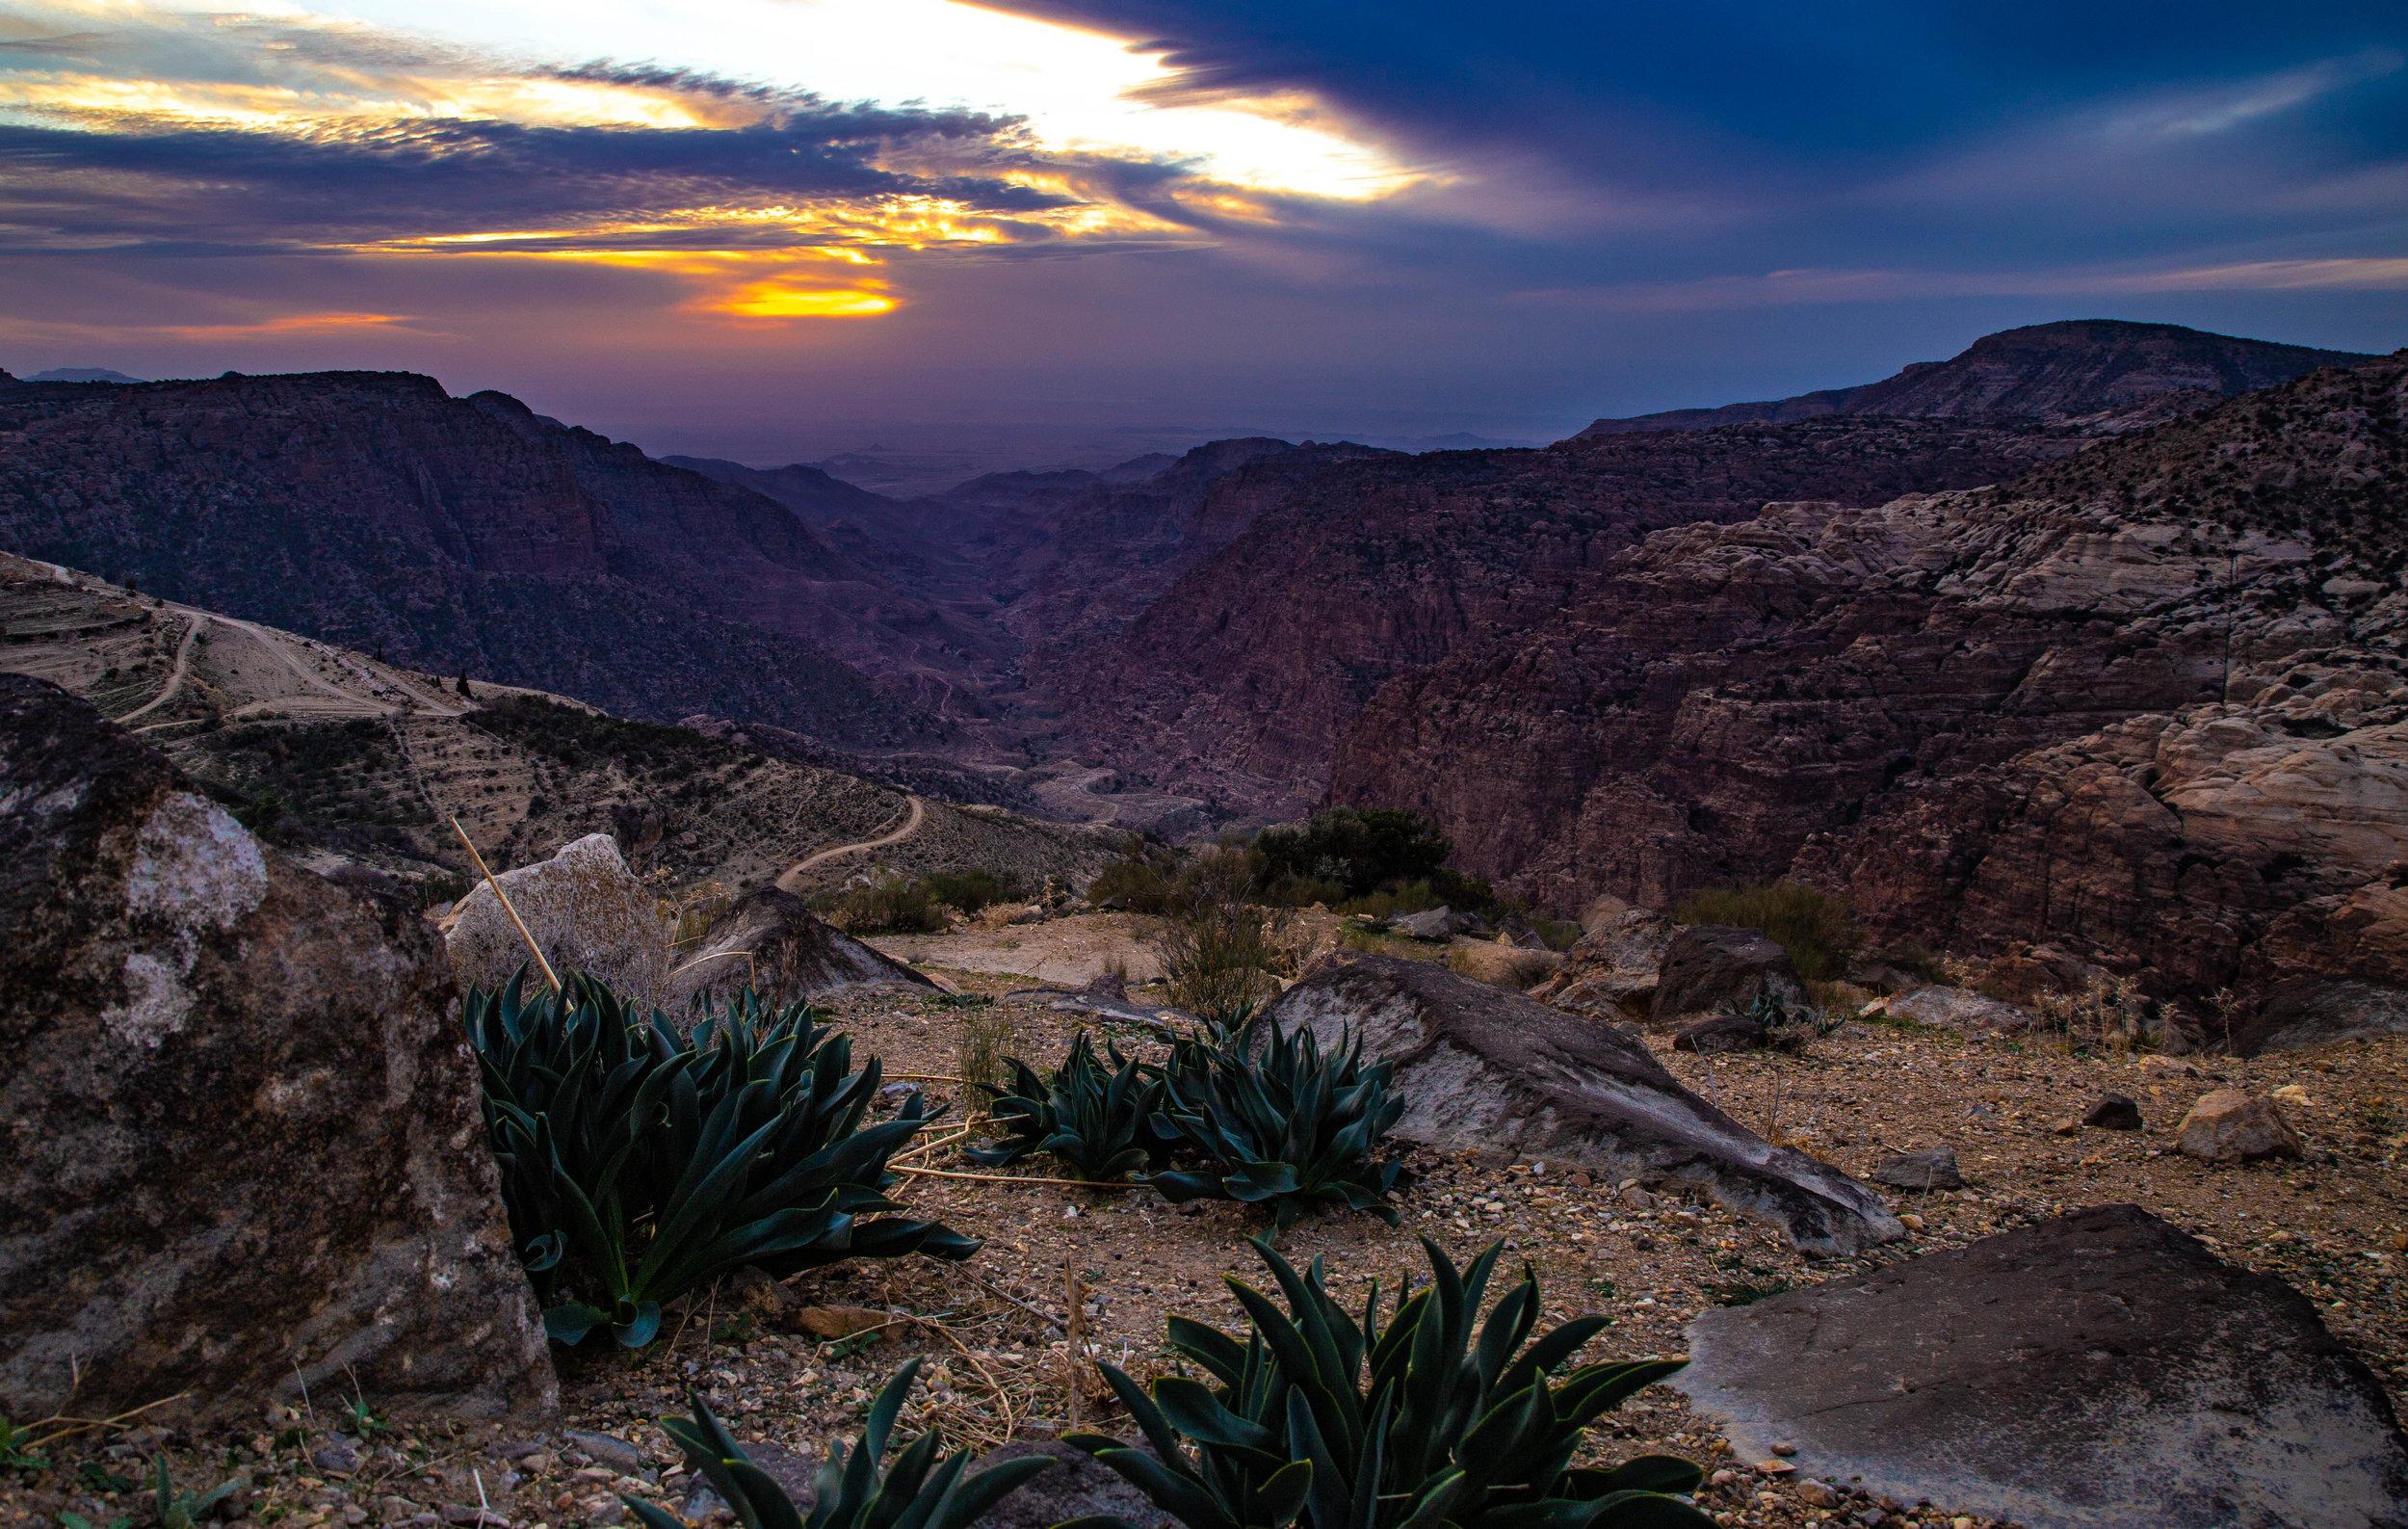 The View of Dana from near Wadi Dana Eco Camp